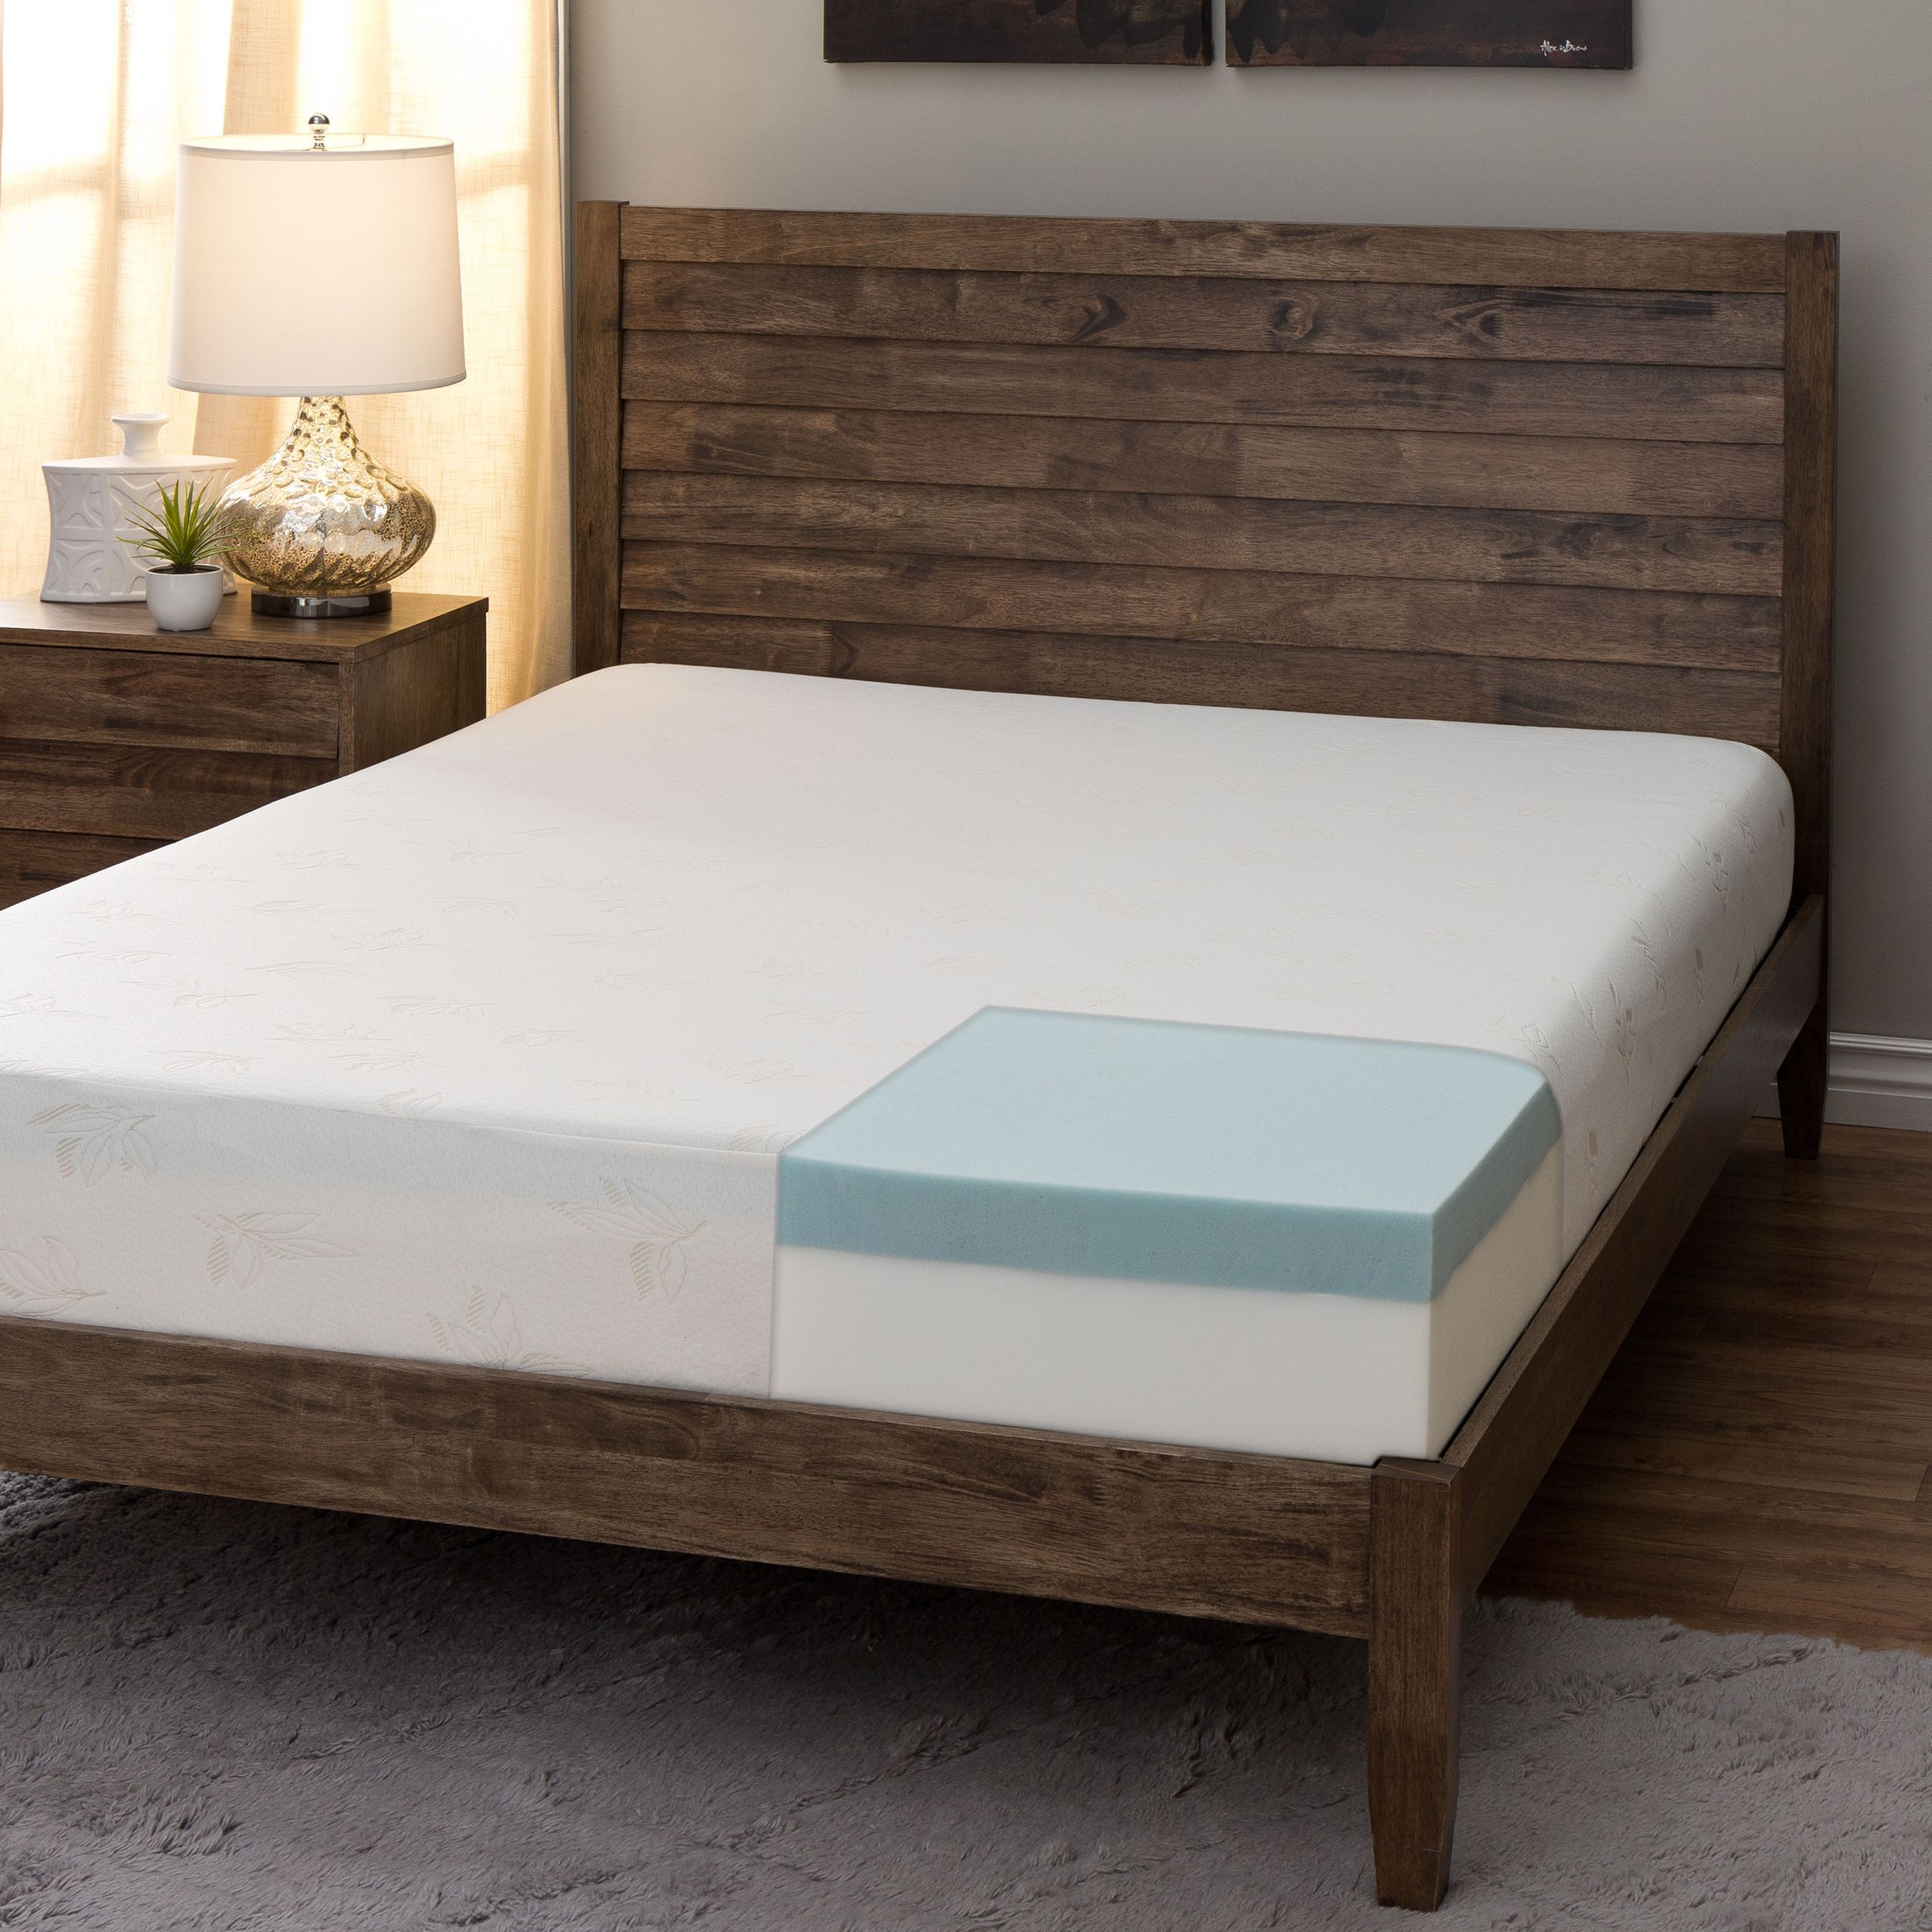 Comfort Dreams 8 Inch Queen Size Memory Foam Mattress Medium